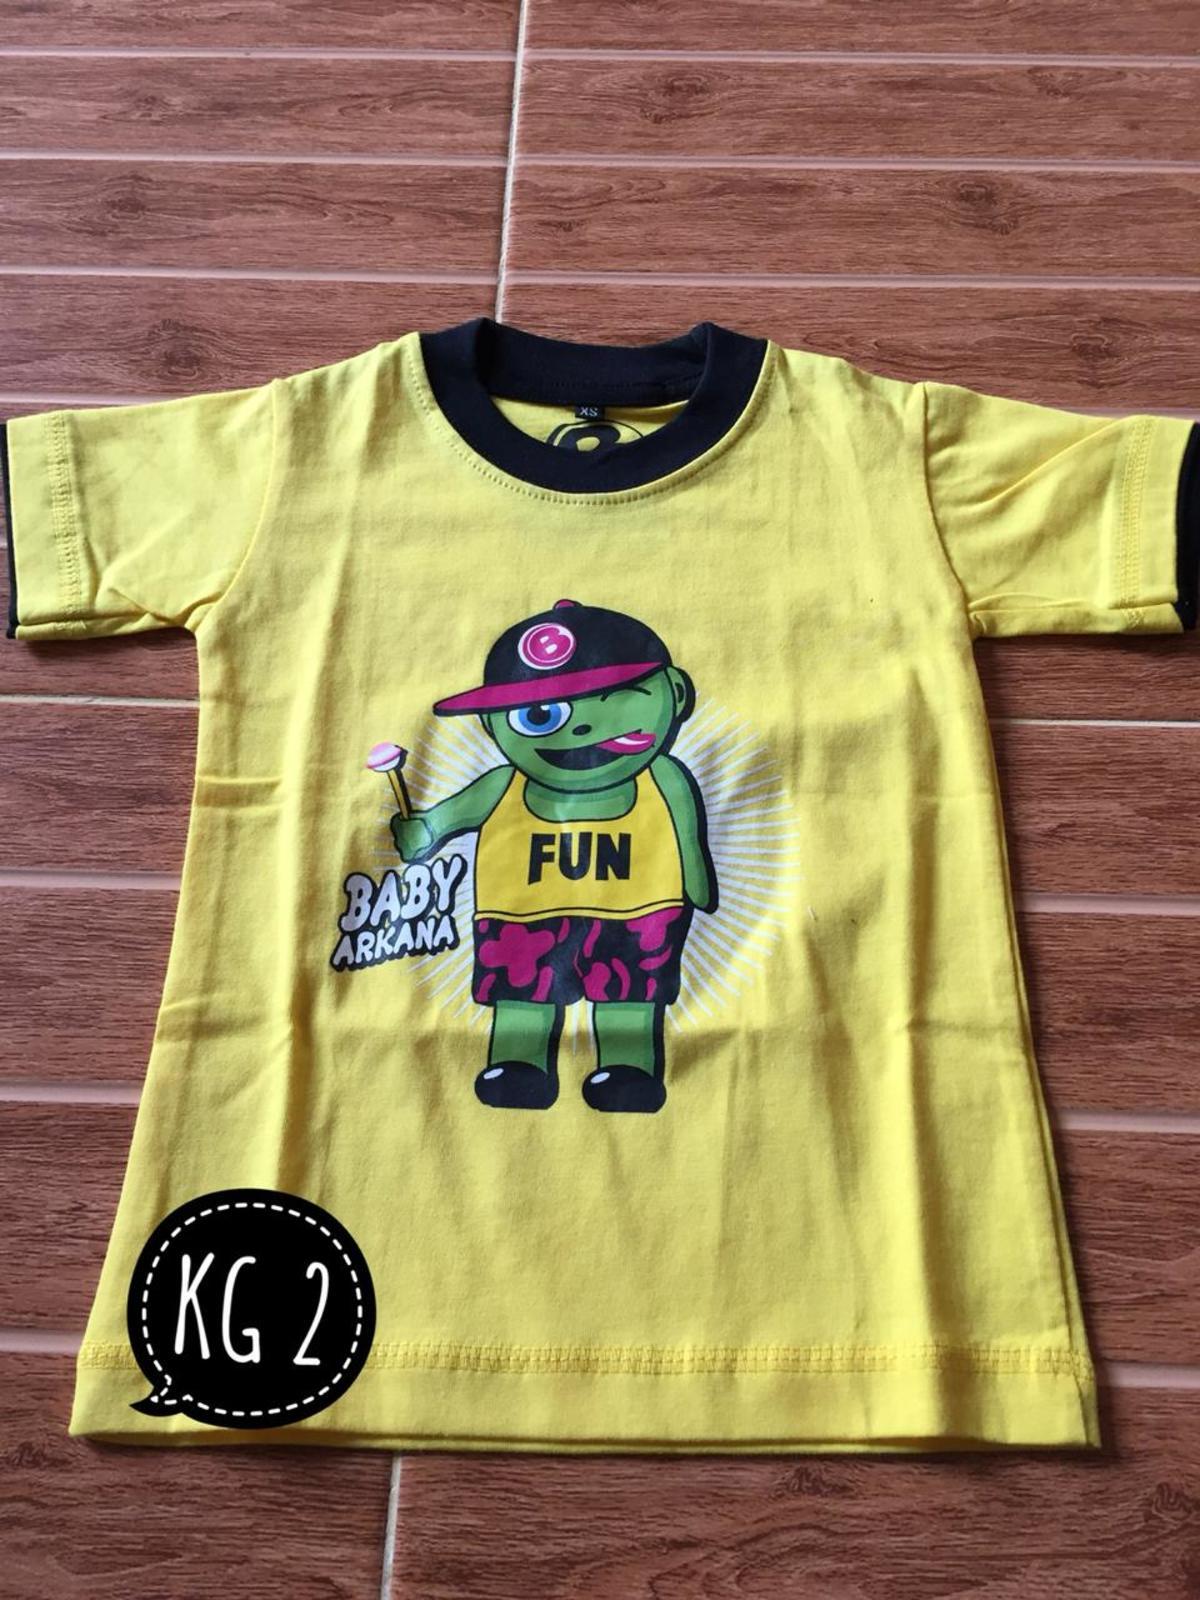 produksi pakaian anak